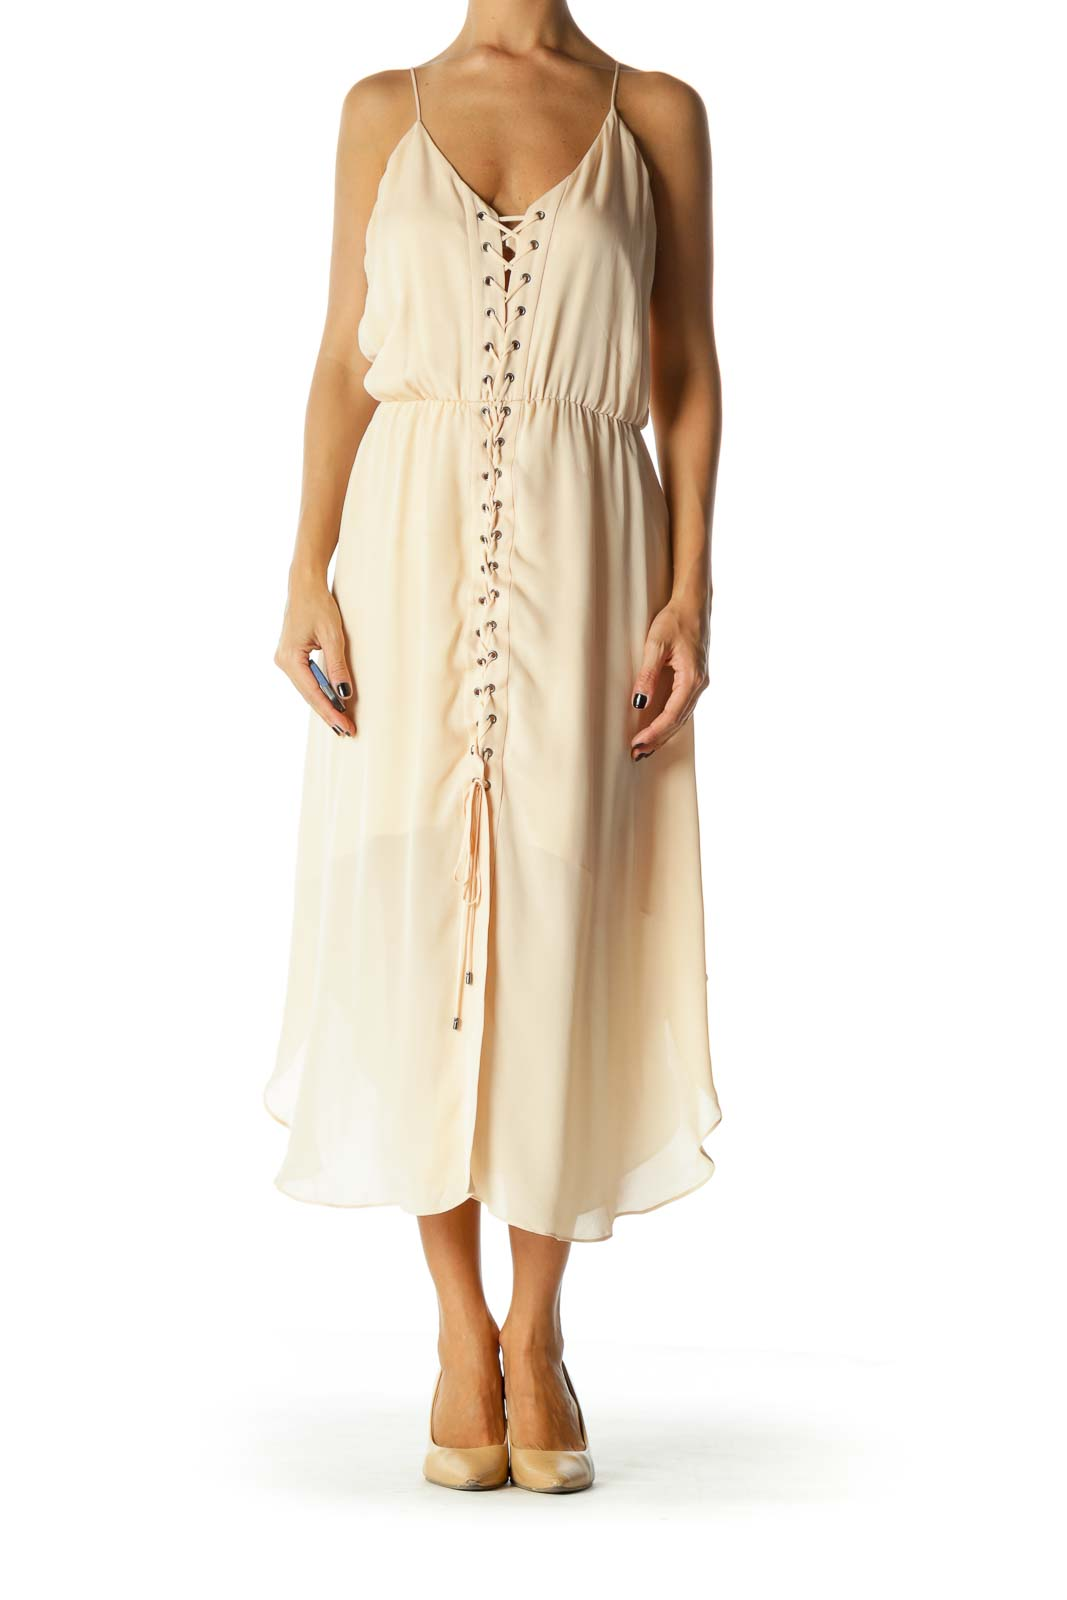 Light Peach Criscross Elastic Waist V-Neck Dress Front